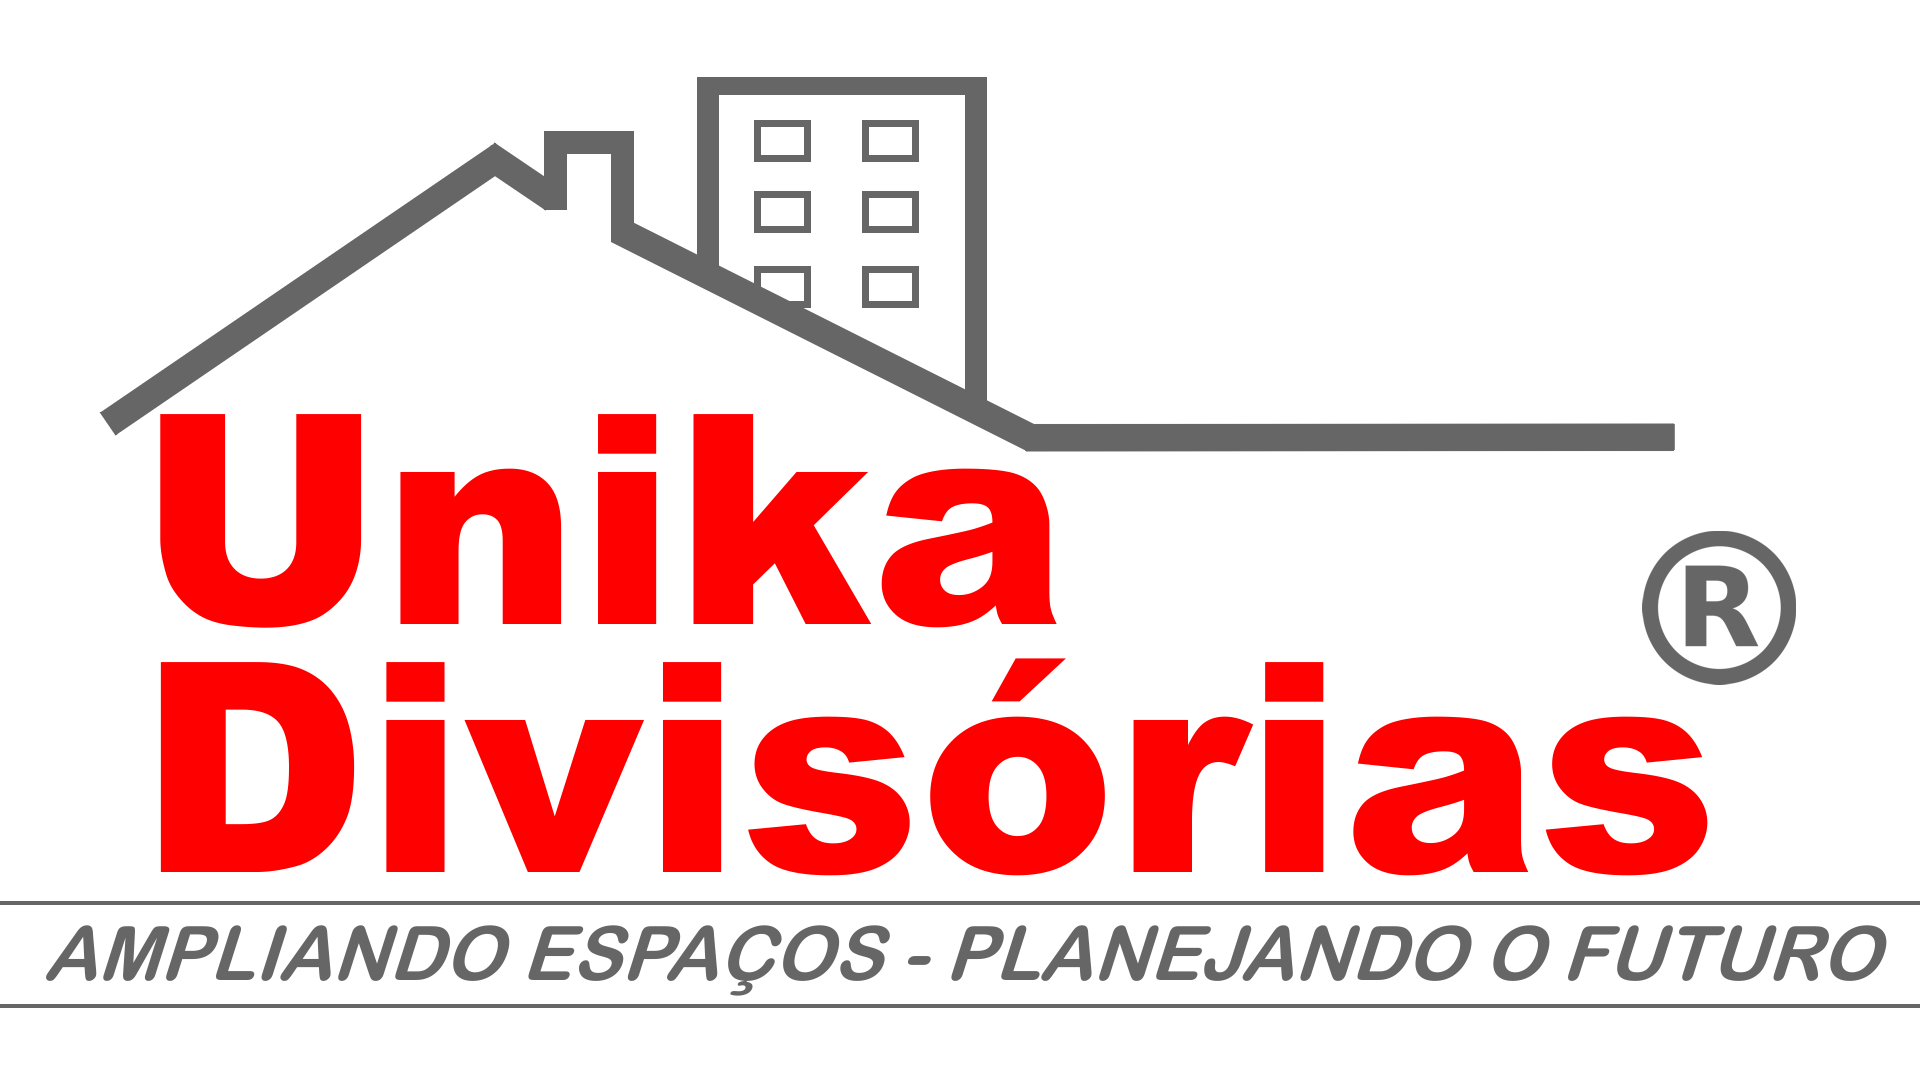 Logo Unika Divisórias